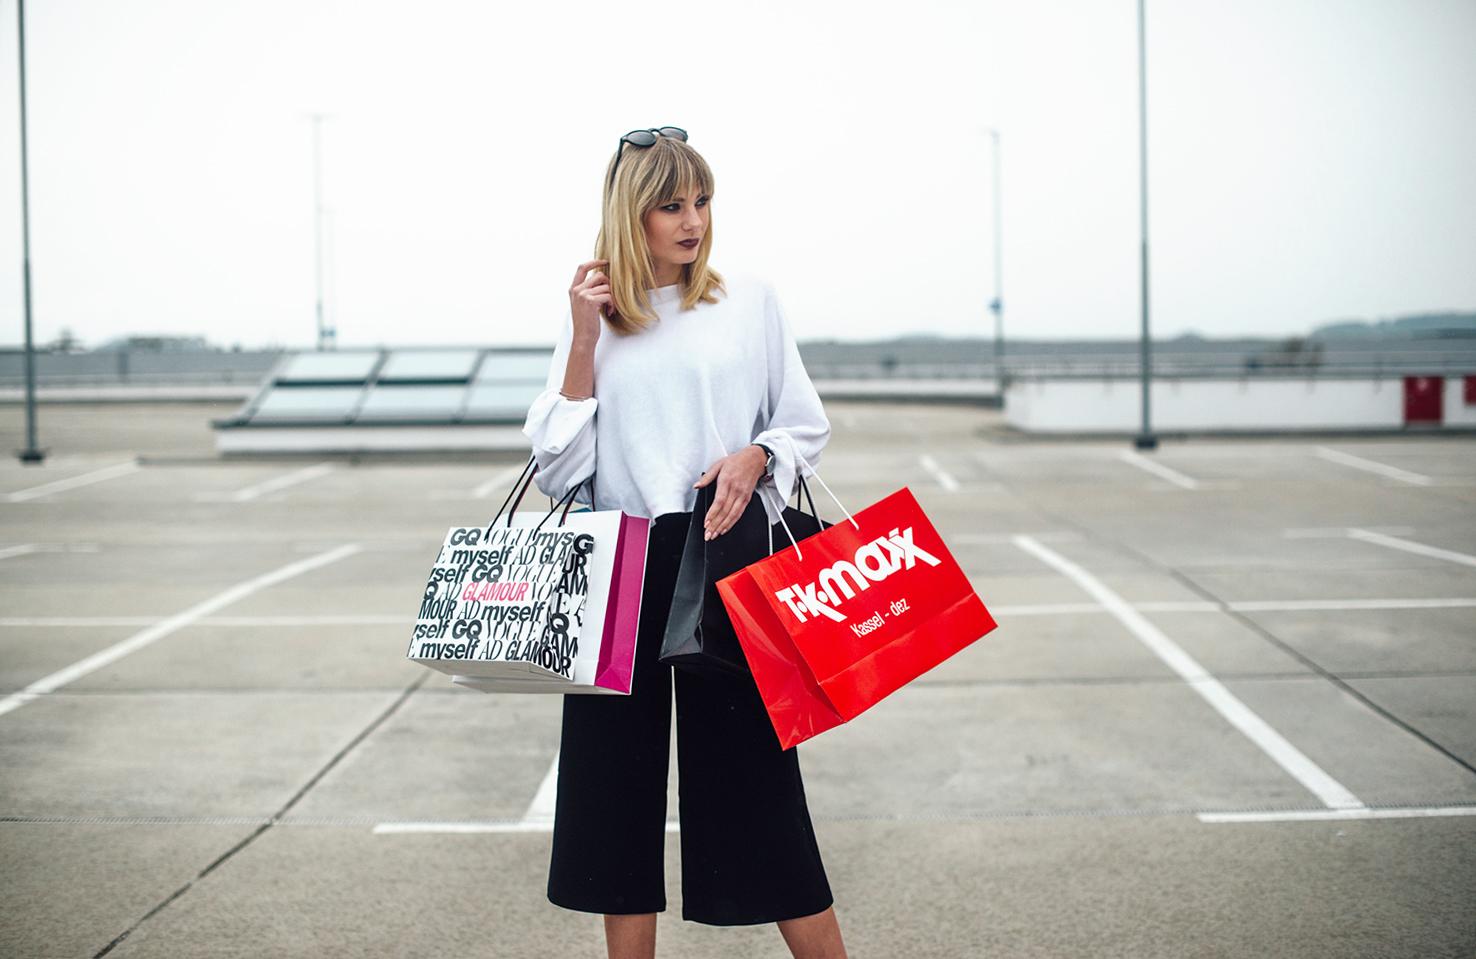 Kiamisu_Modeblog_Hna7_HnaSieben_Fehlkäufe vermeiden_Shopping Tipps-2_final 7